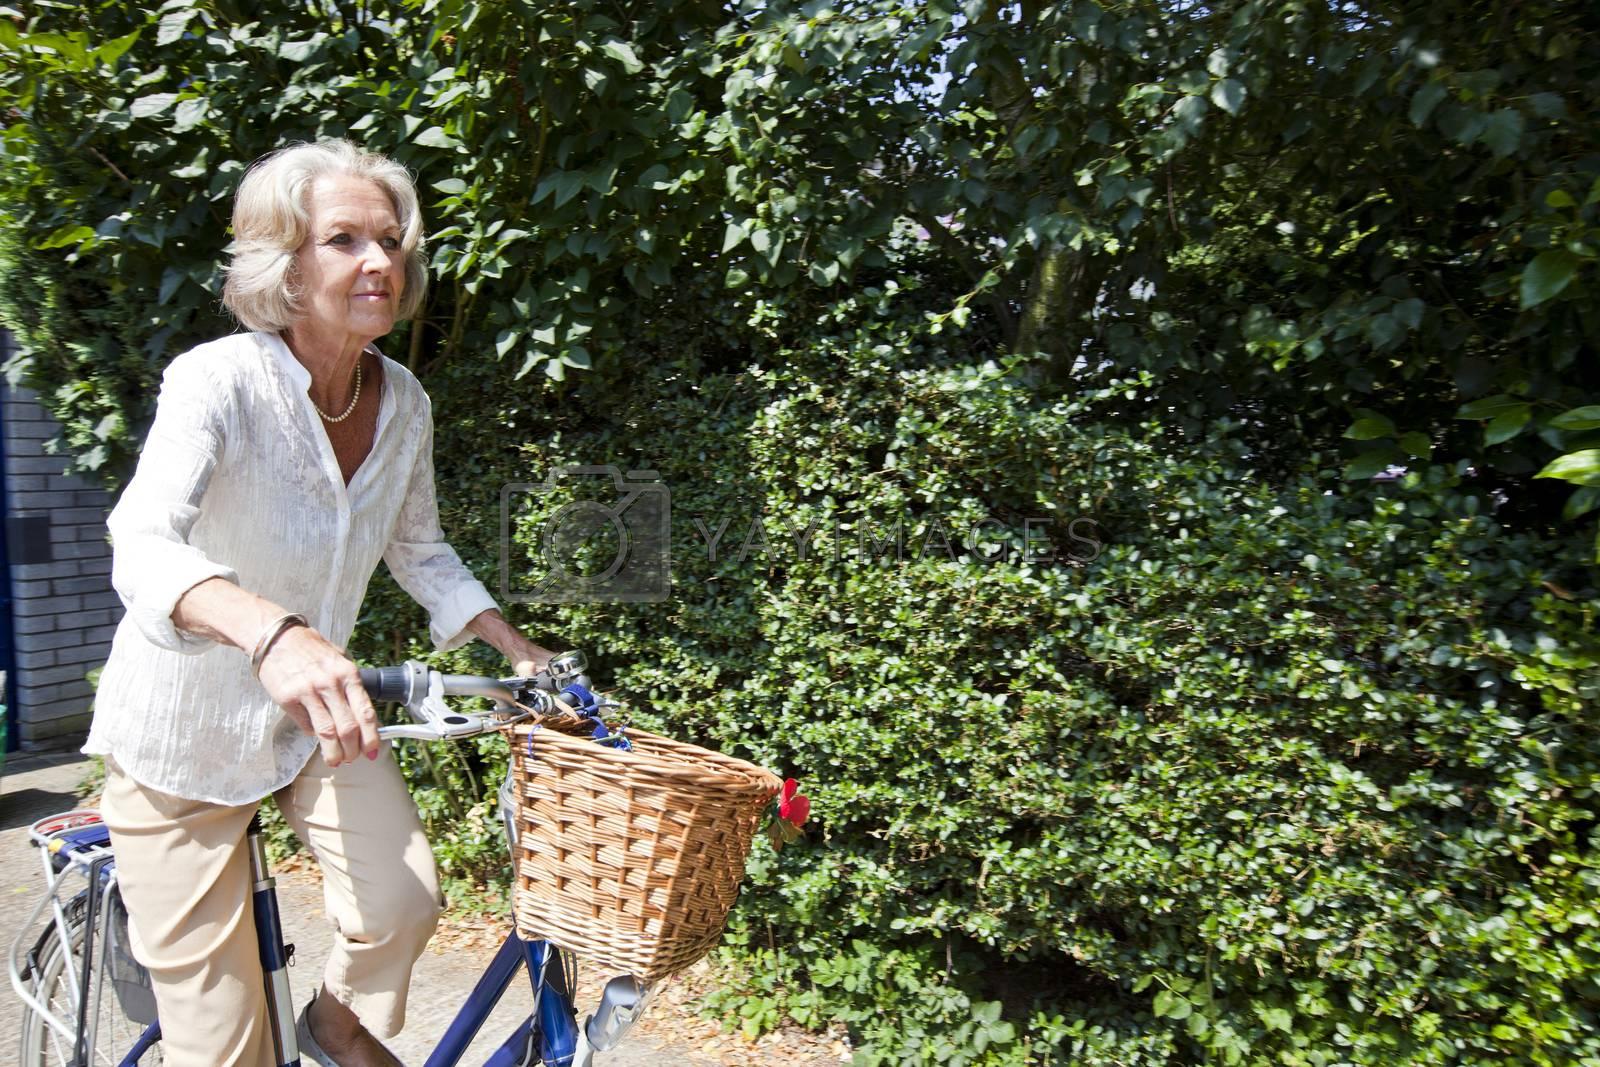 Active senior woman riding bicycle in backyard